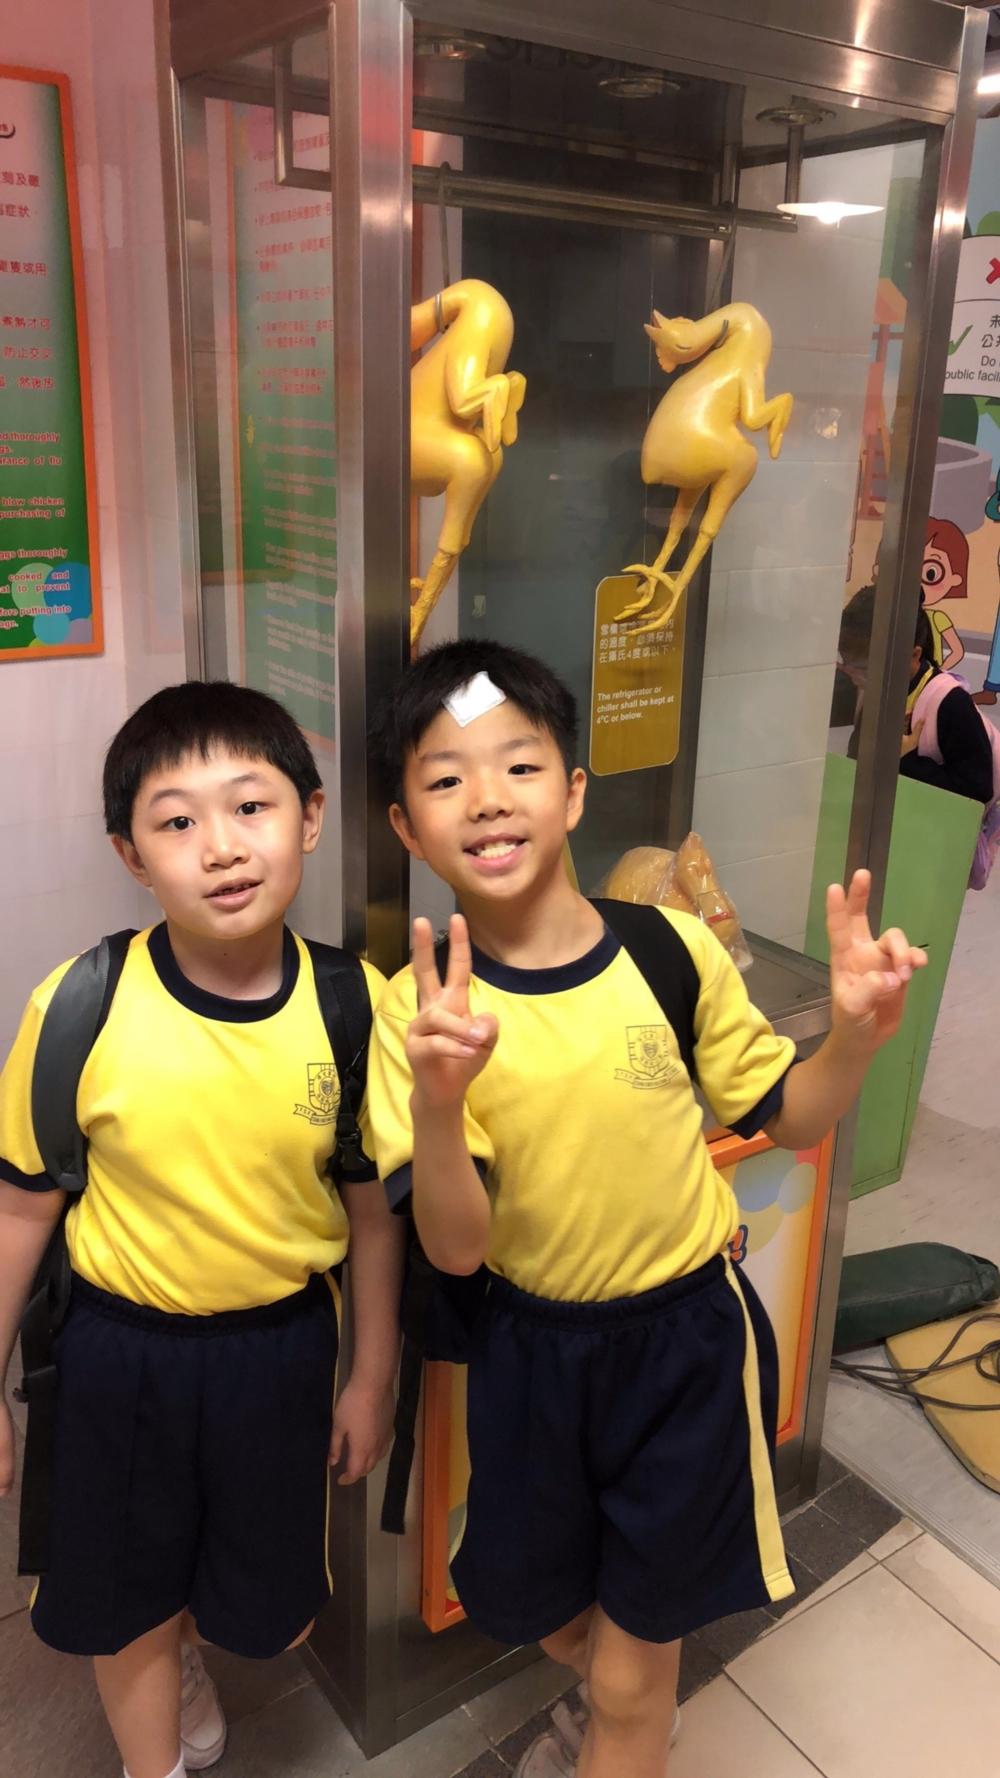 http://pohckwps.edu.hk/sites/default/files/19_13.jpg